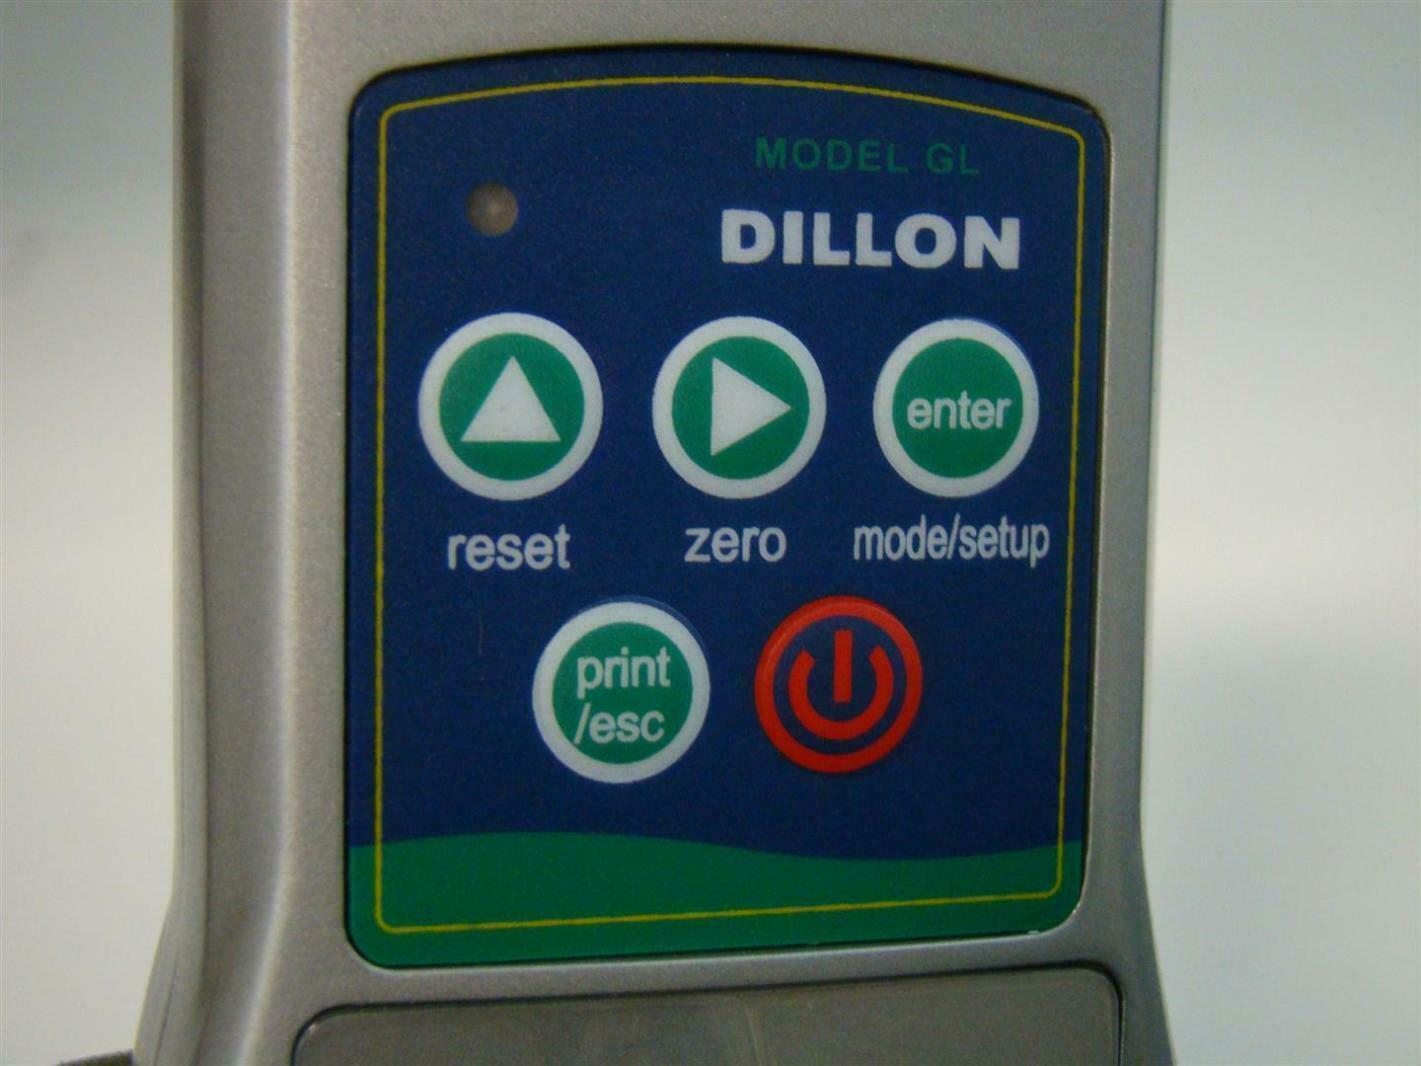 Dillon GL Digital Force Gauge 061200000064 36321 0030 RS-232C